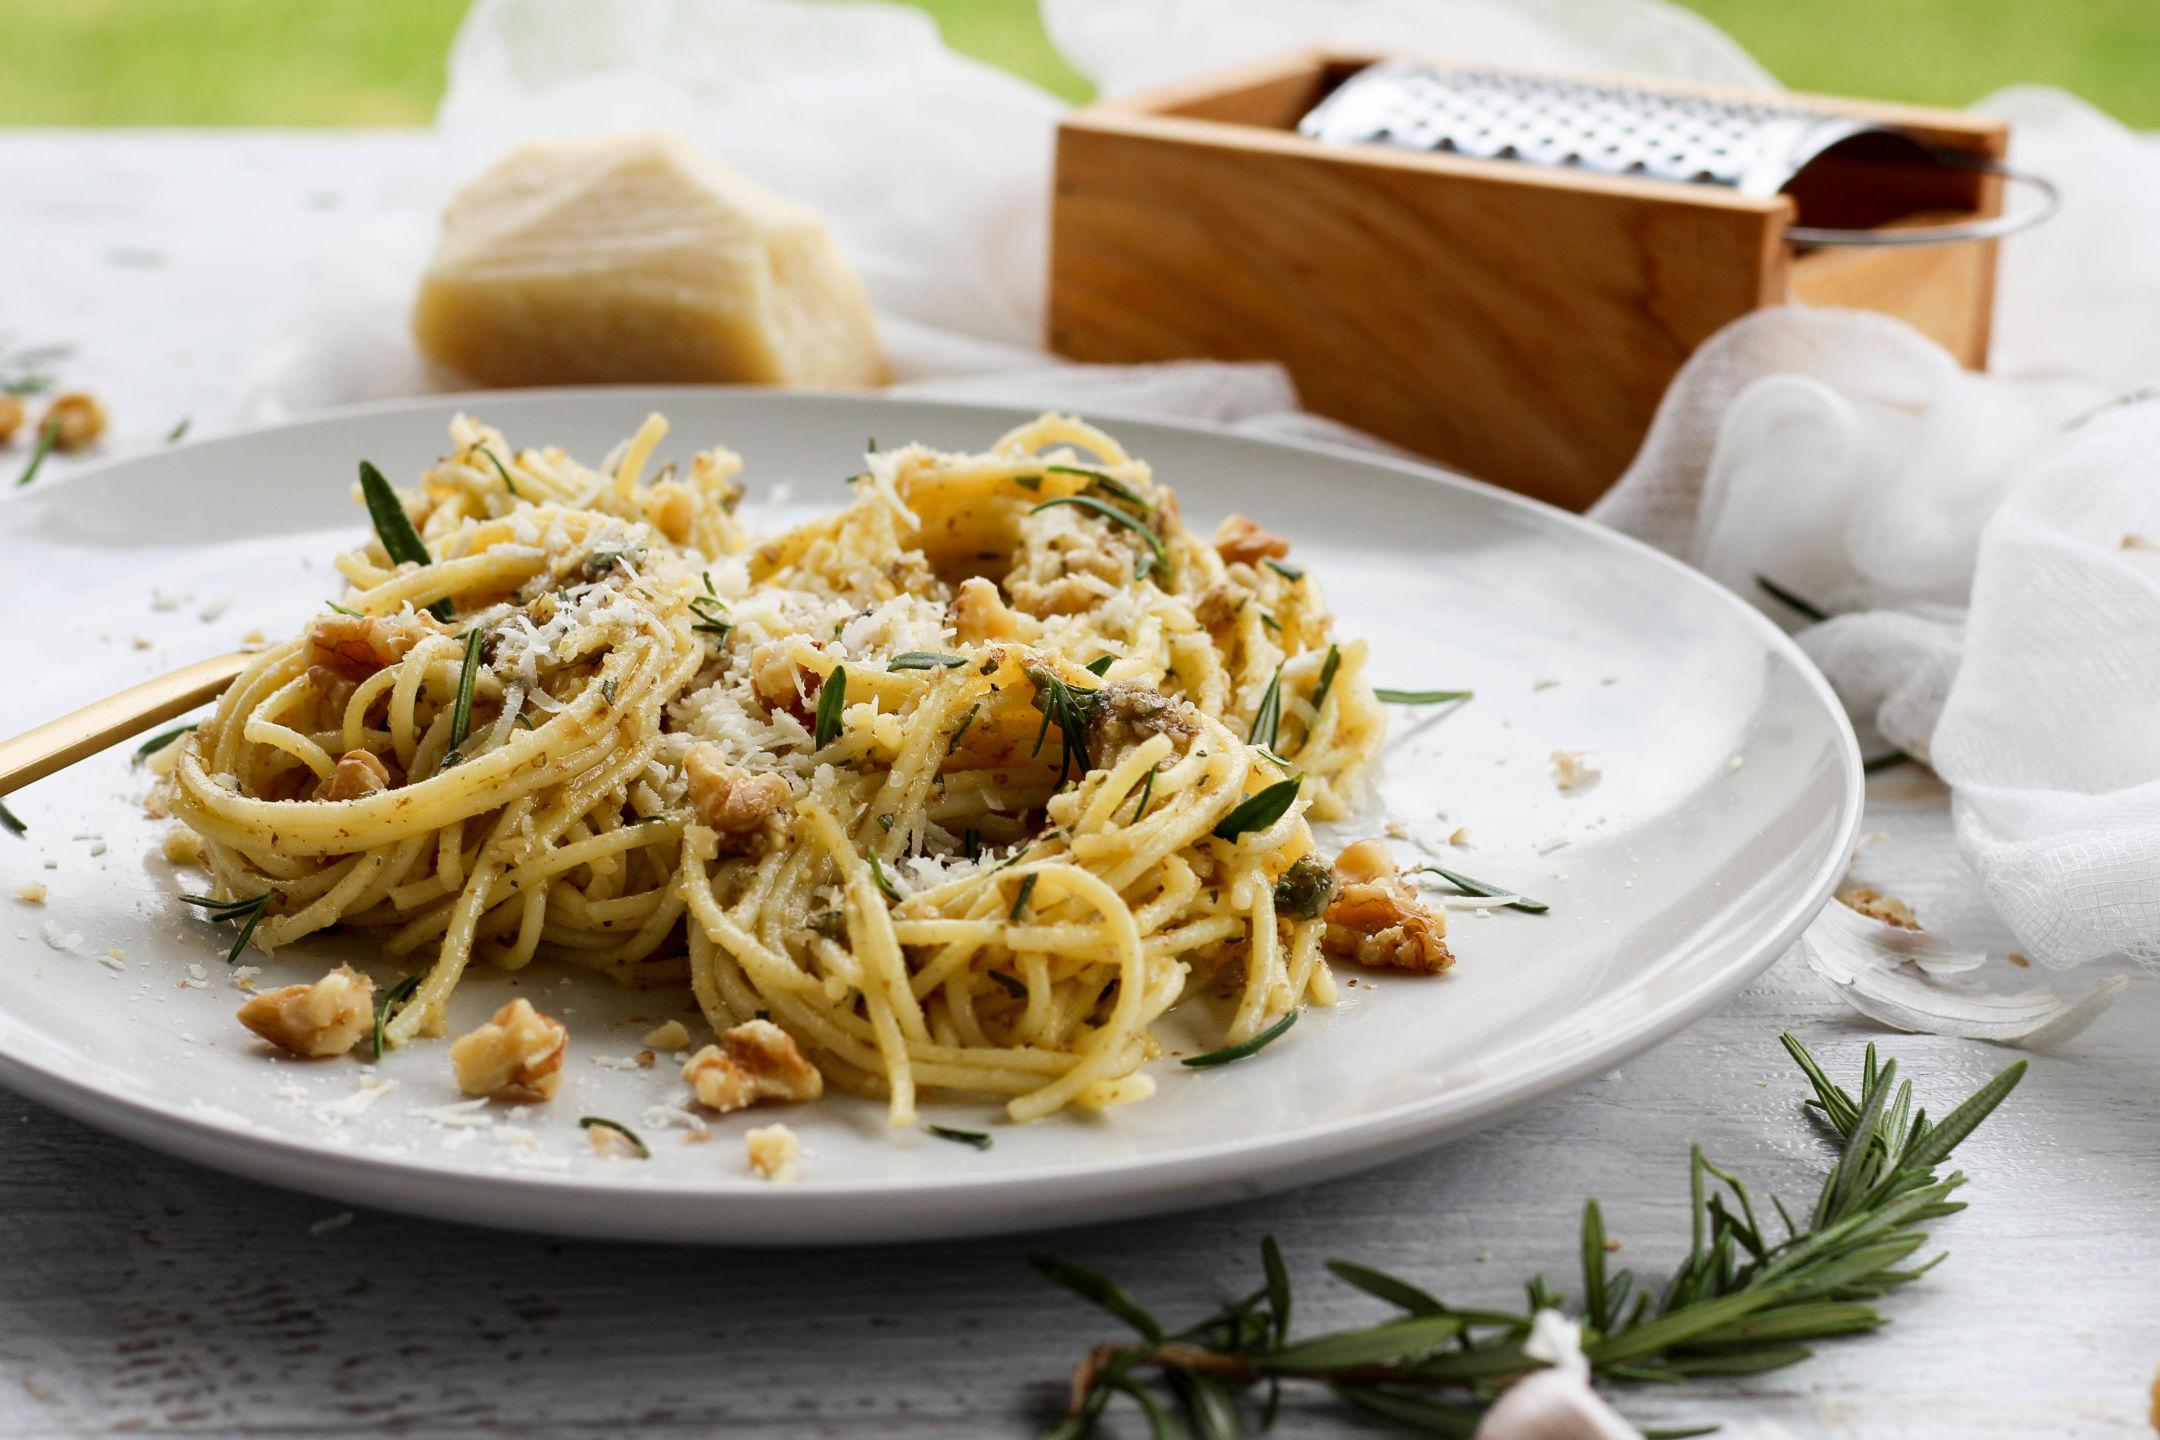 Gluten Free Spaghetti with Walnut Rosemary Pesto Recipe